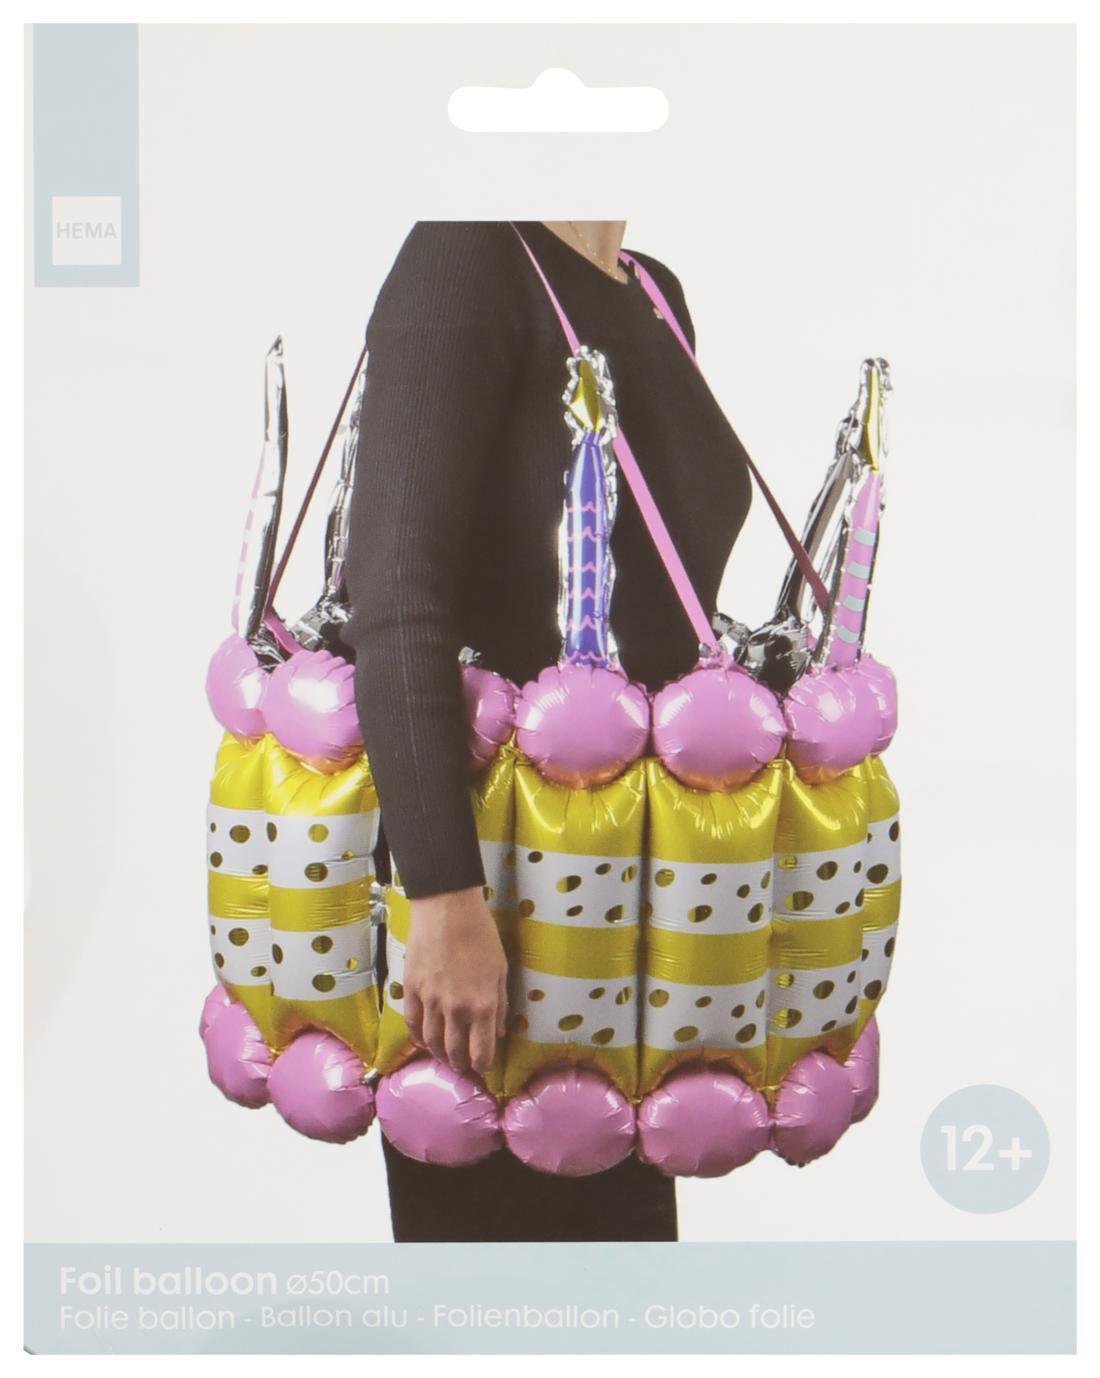 HEMA Folieballon Ø 50 Cm - Verkleedset Taart